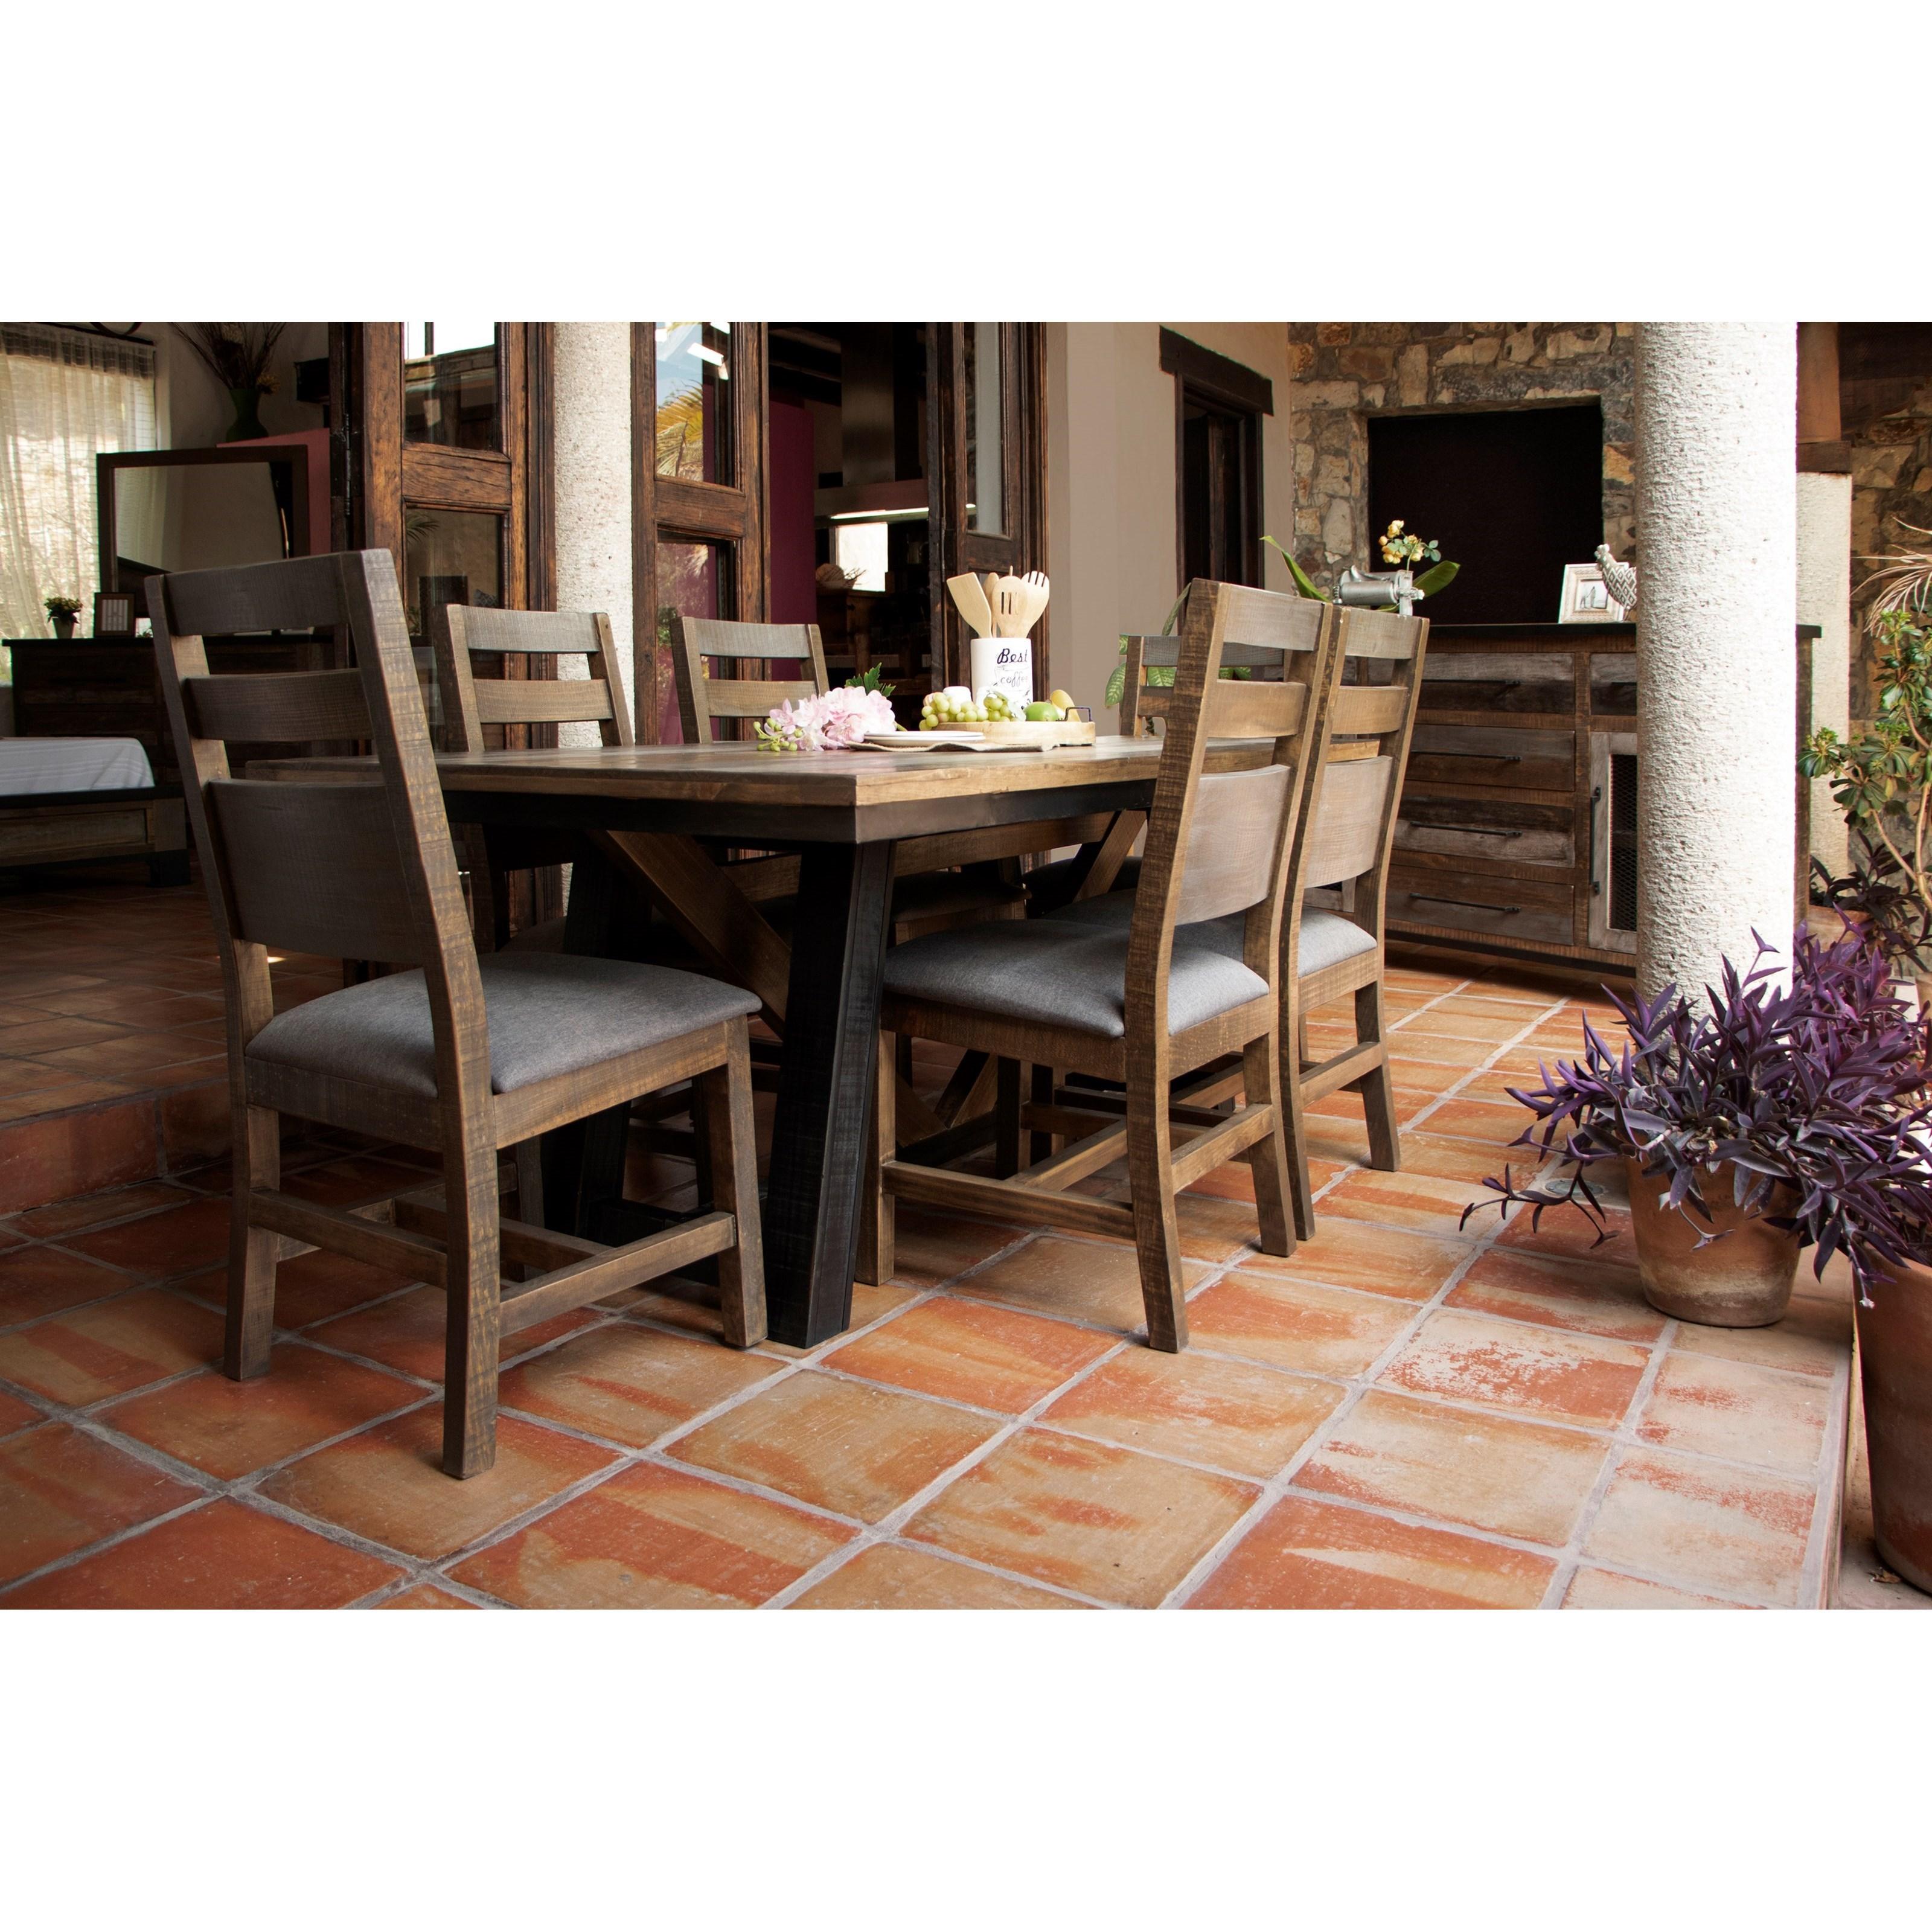 Antique Dining Set by International Furniture Direct at Catalog Outlet